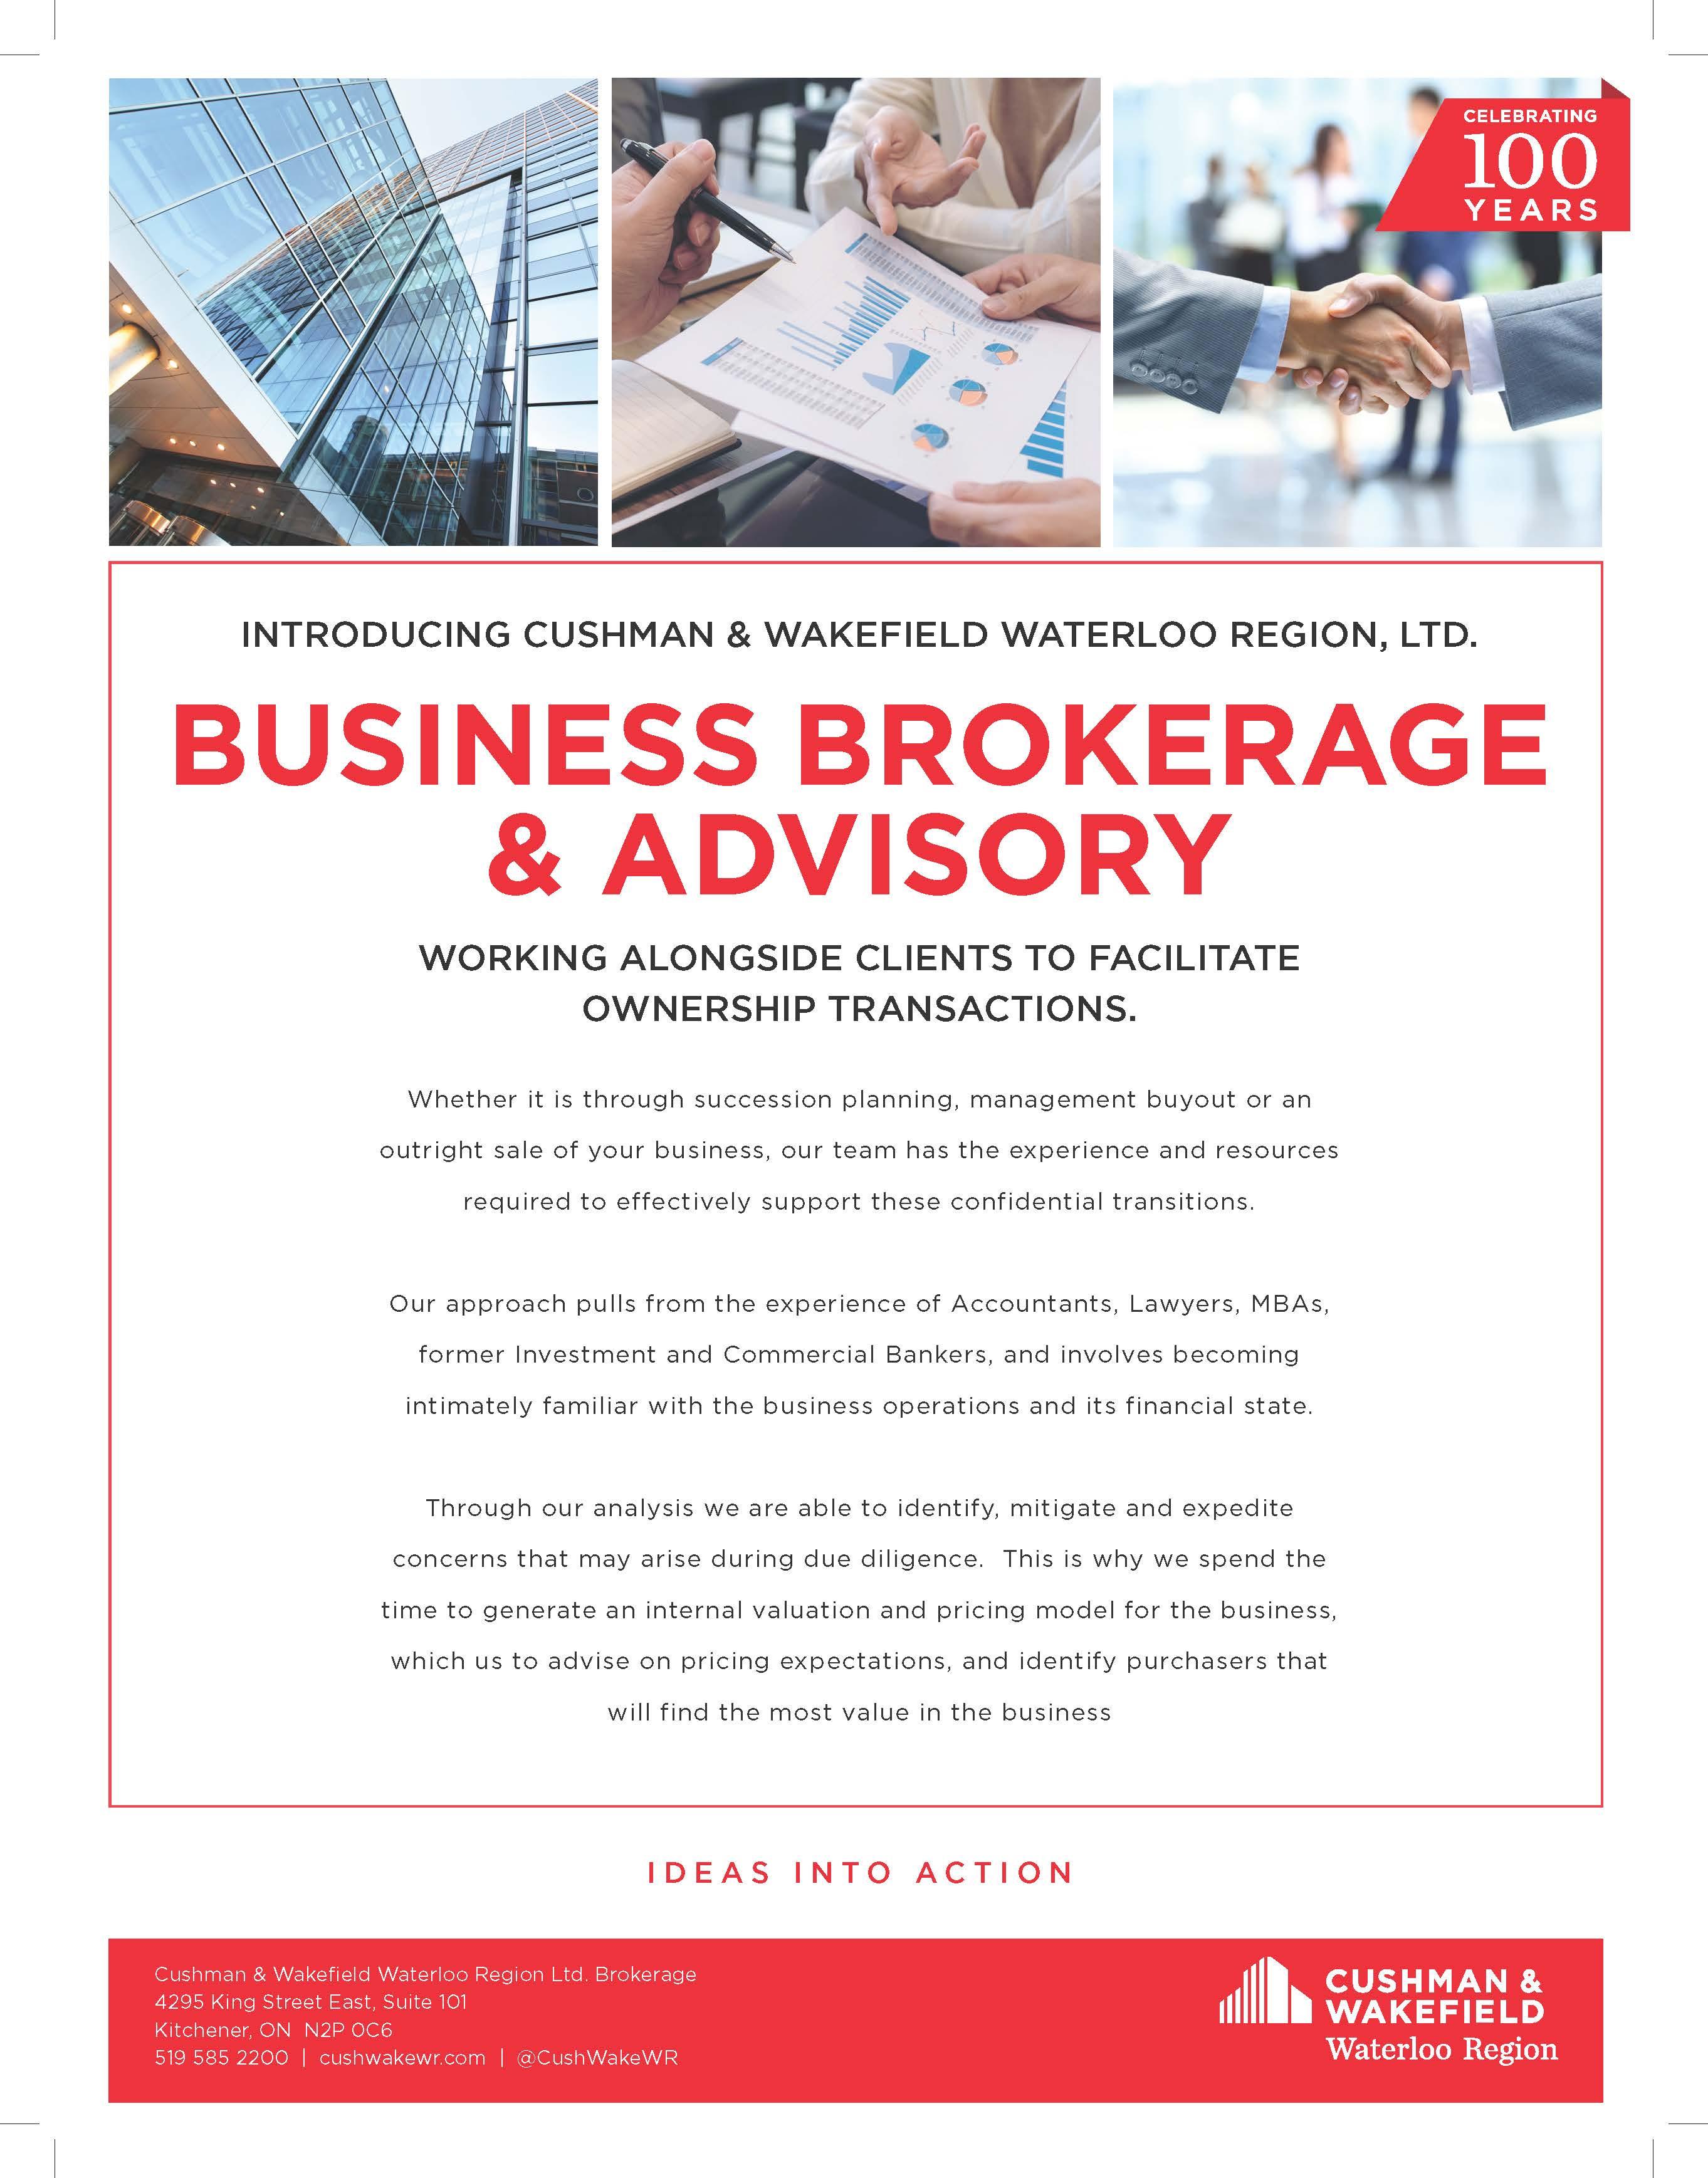 Cushman & Wakefield Business Brokerage & Advisory Services